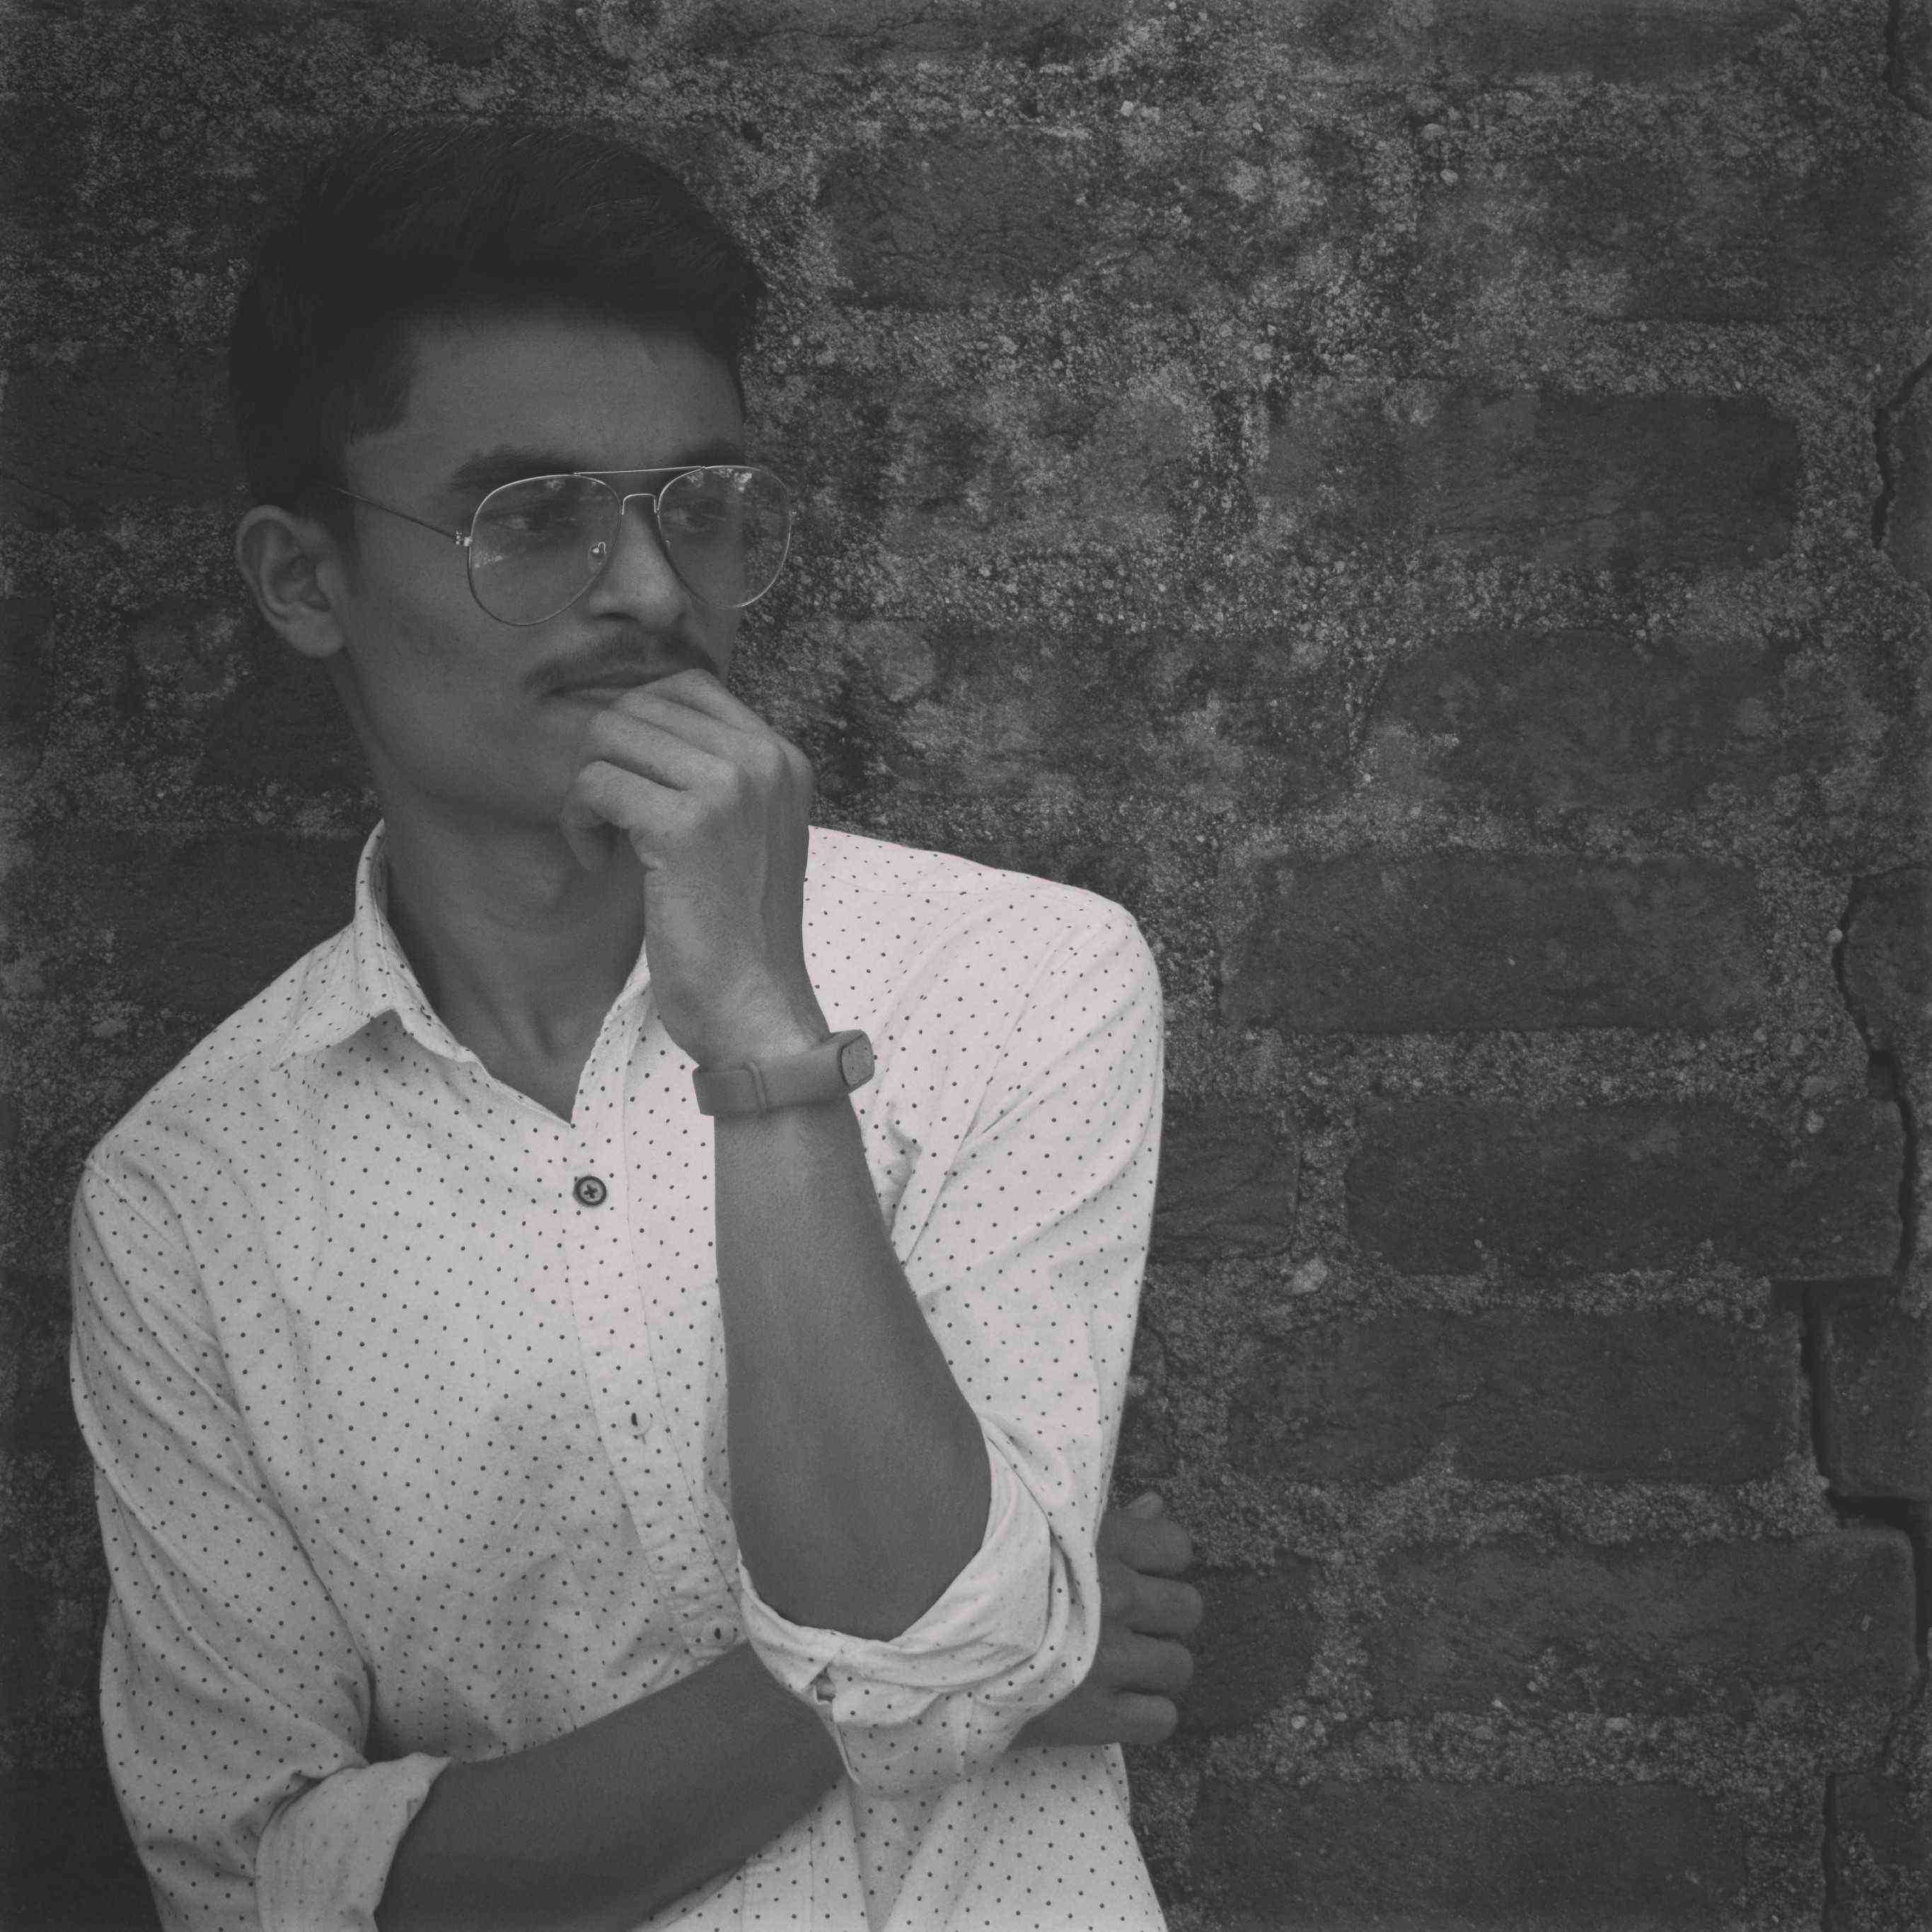 sagar deshmukh #sagardeshmukhwords Singer🎤 || Writer🖋 #sagardeshmukhsongs My Heart💓-My Thoughts💭 Love to explor